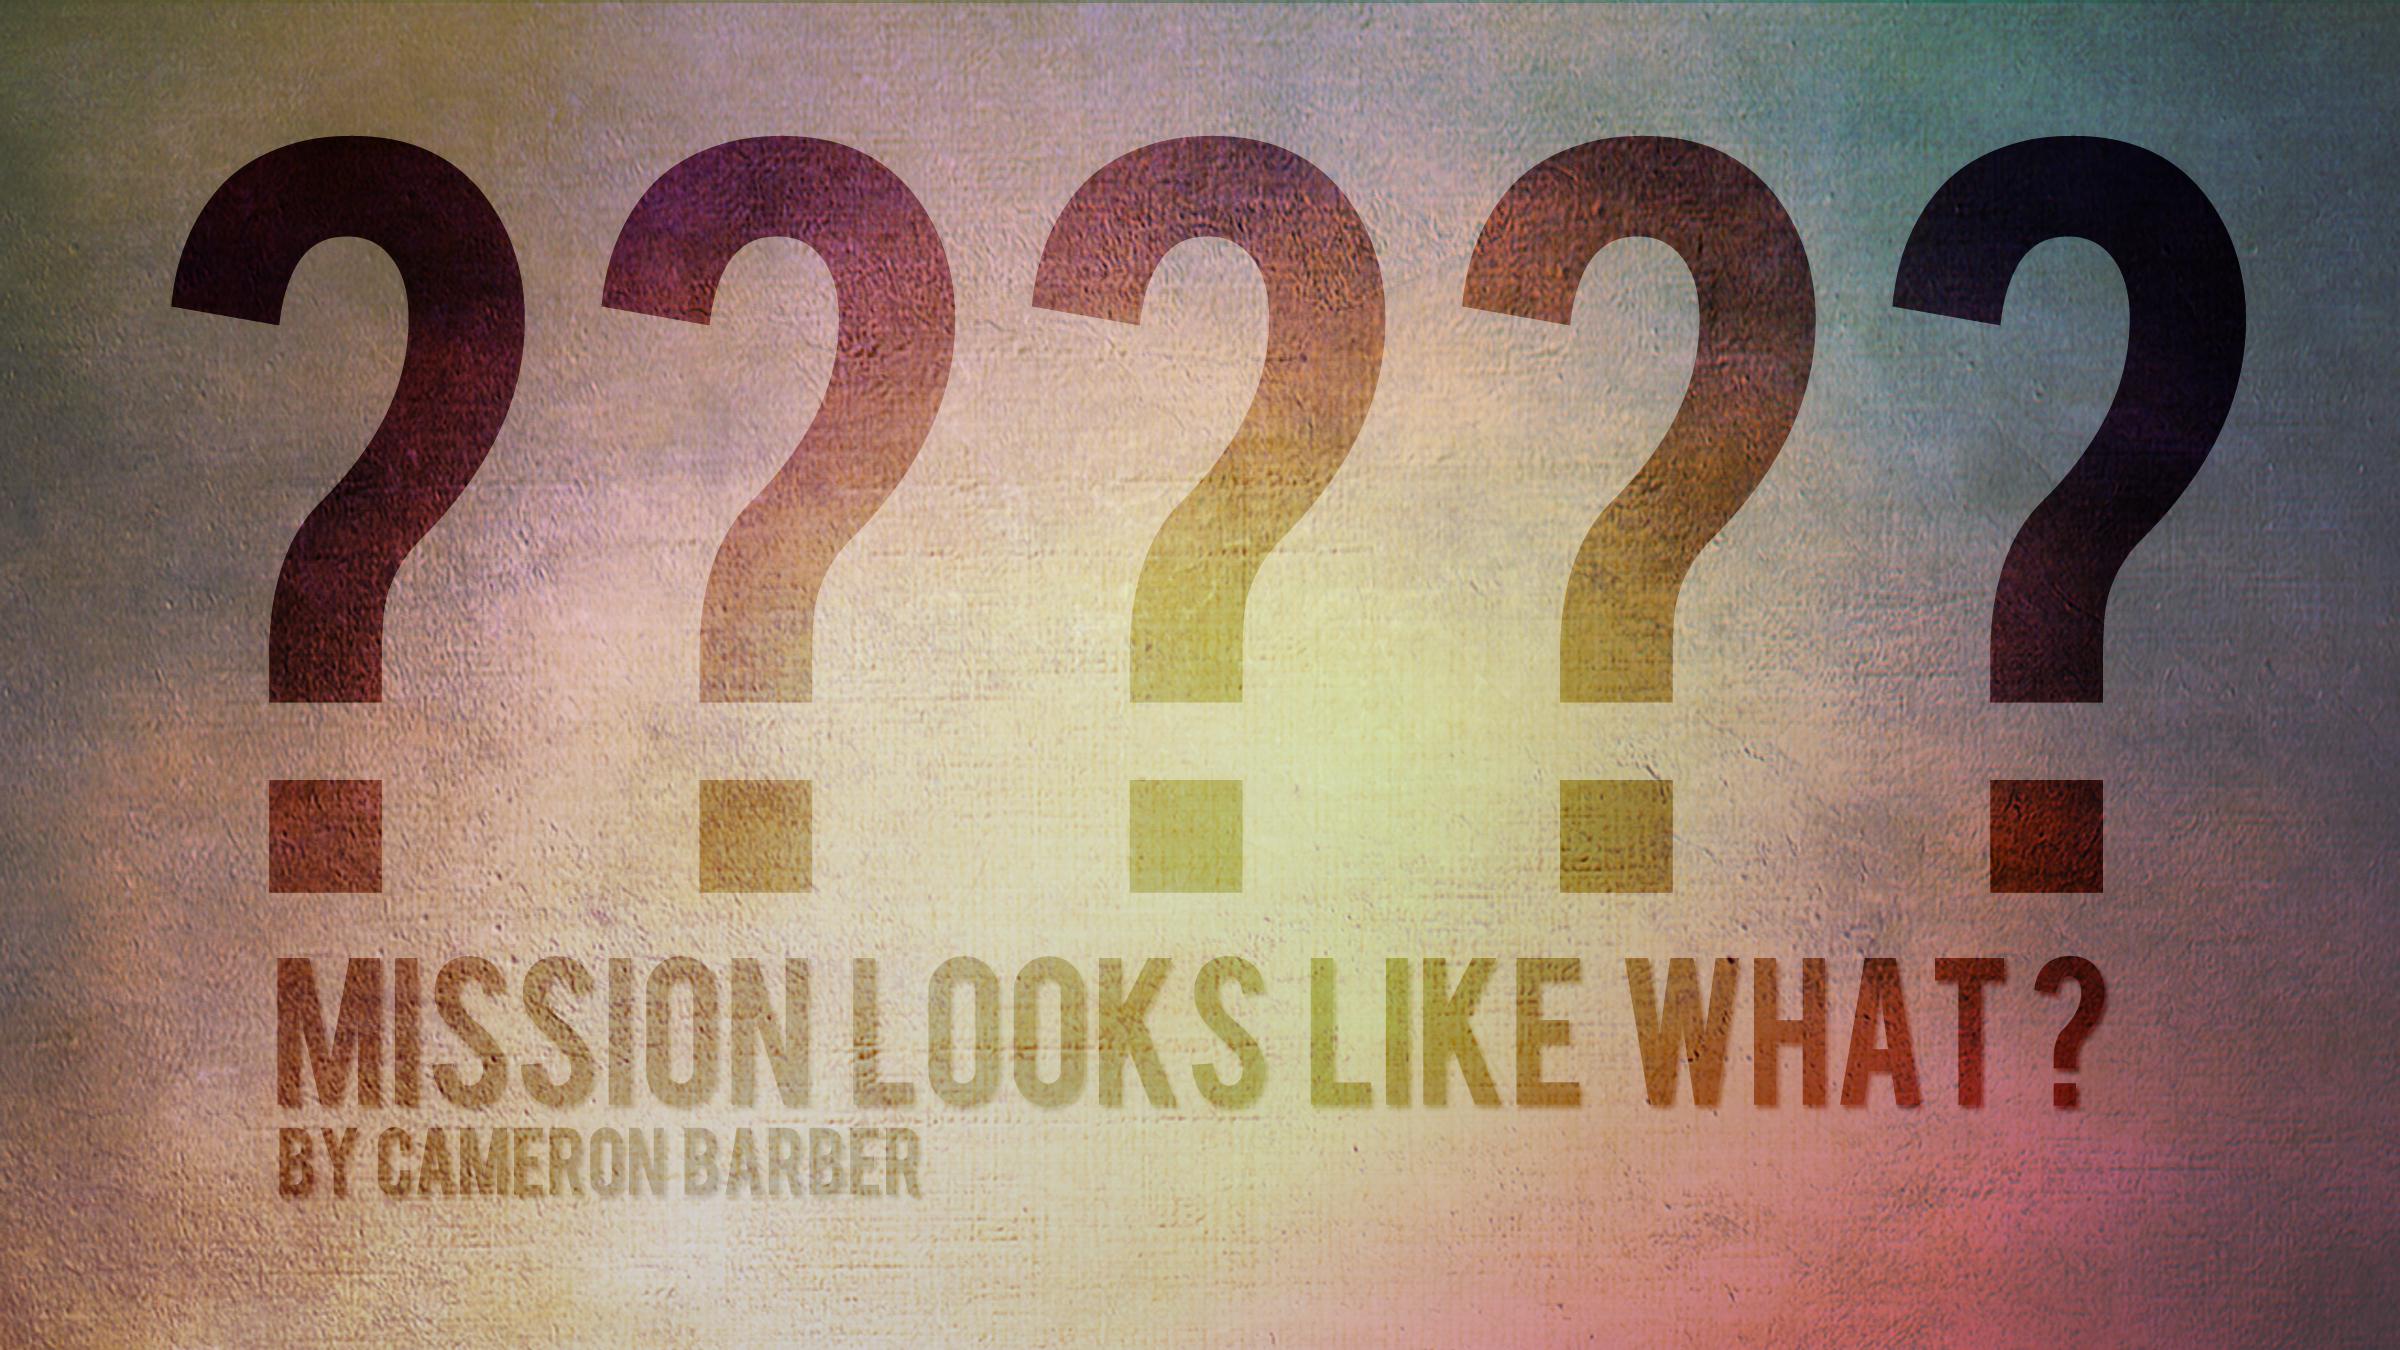 mission looks like what.jpg